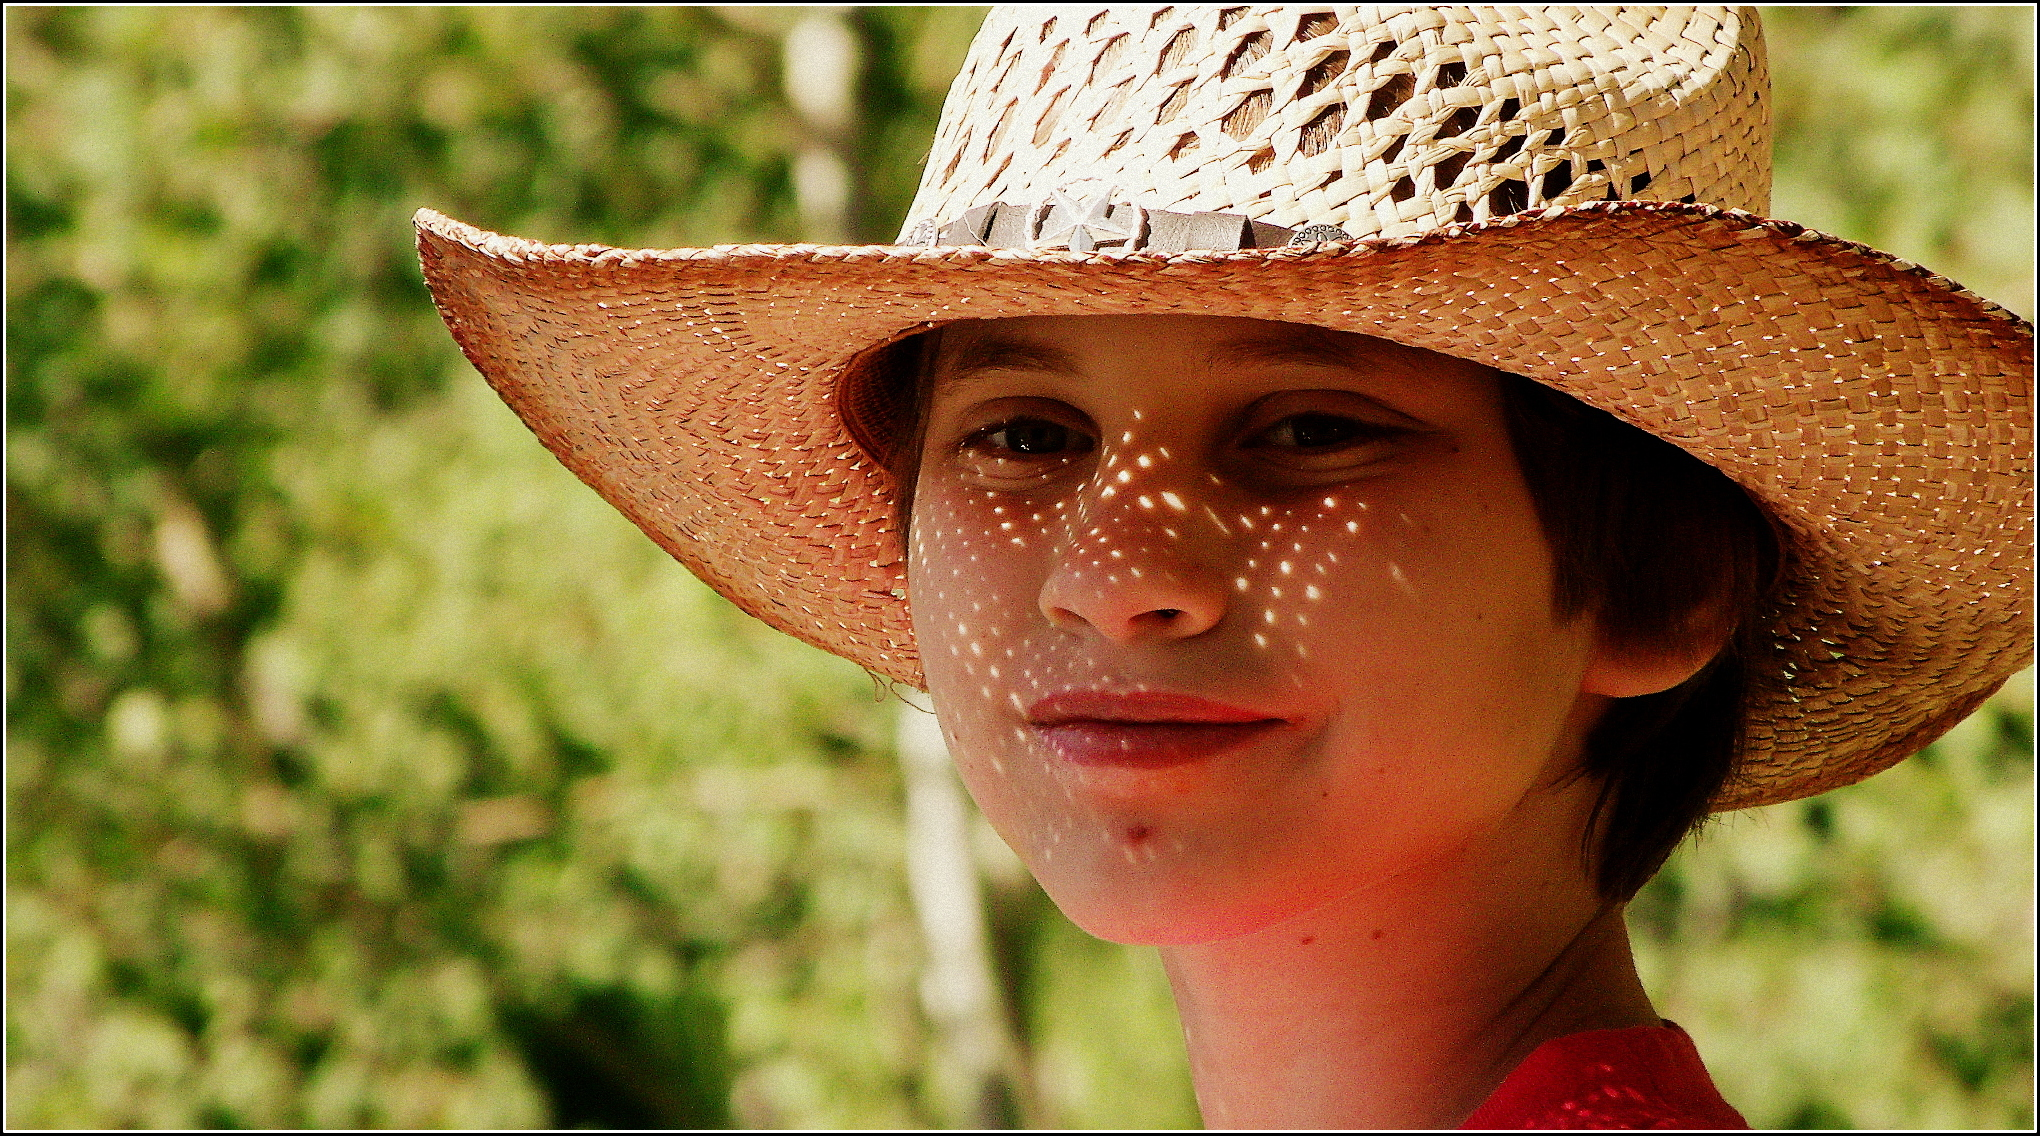 Little One in straw hat